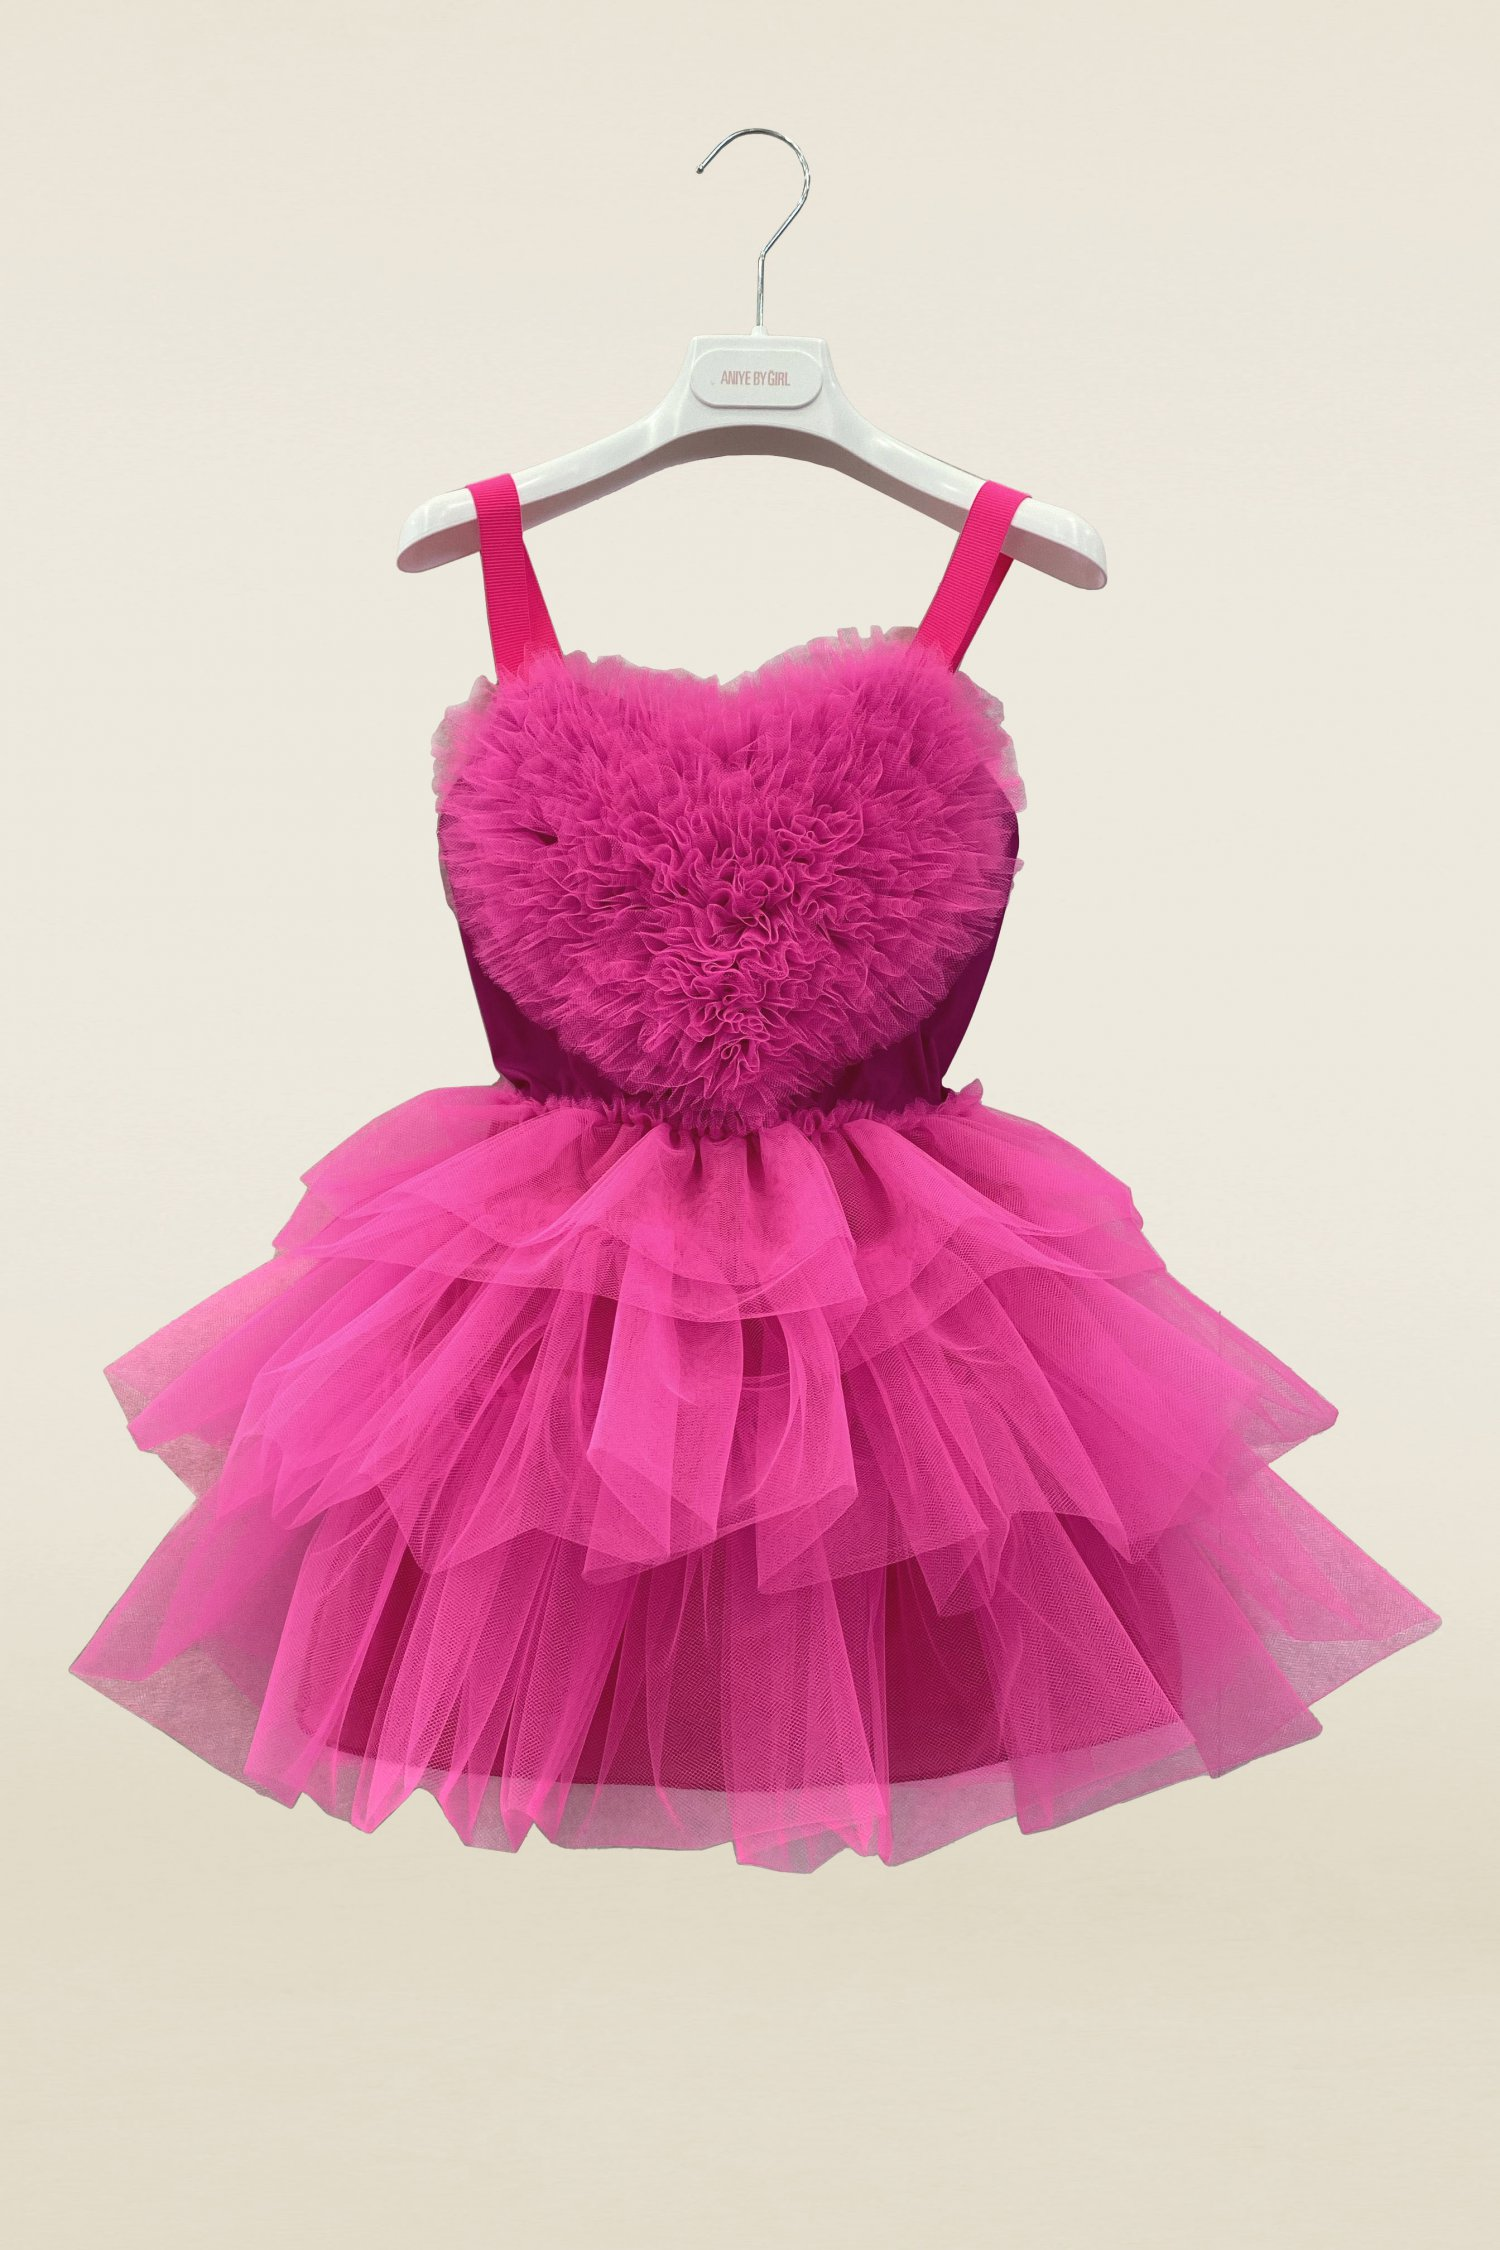 HEART DRESS NINA - GIRL